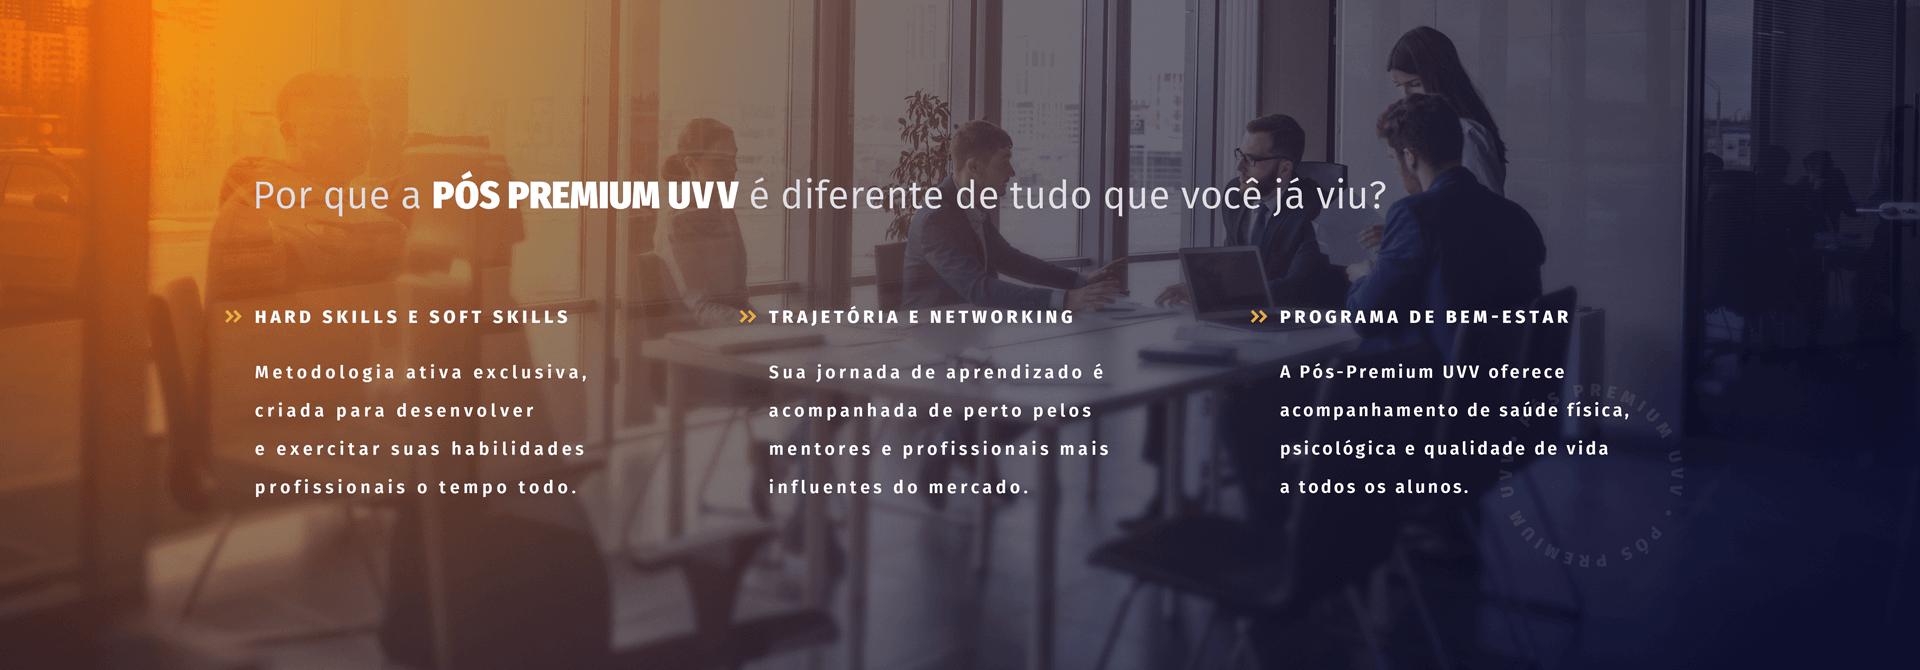 Inscreva-se na Pós Premium UVV